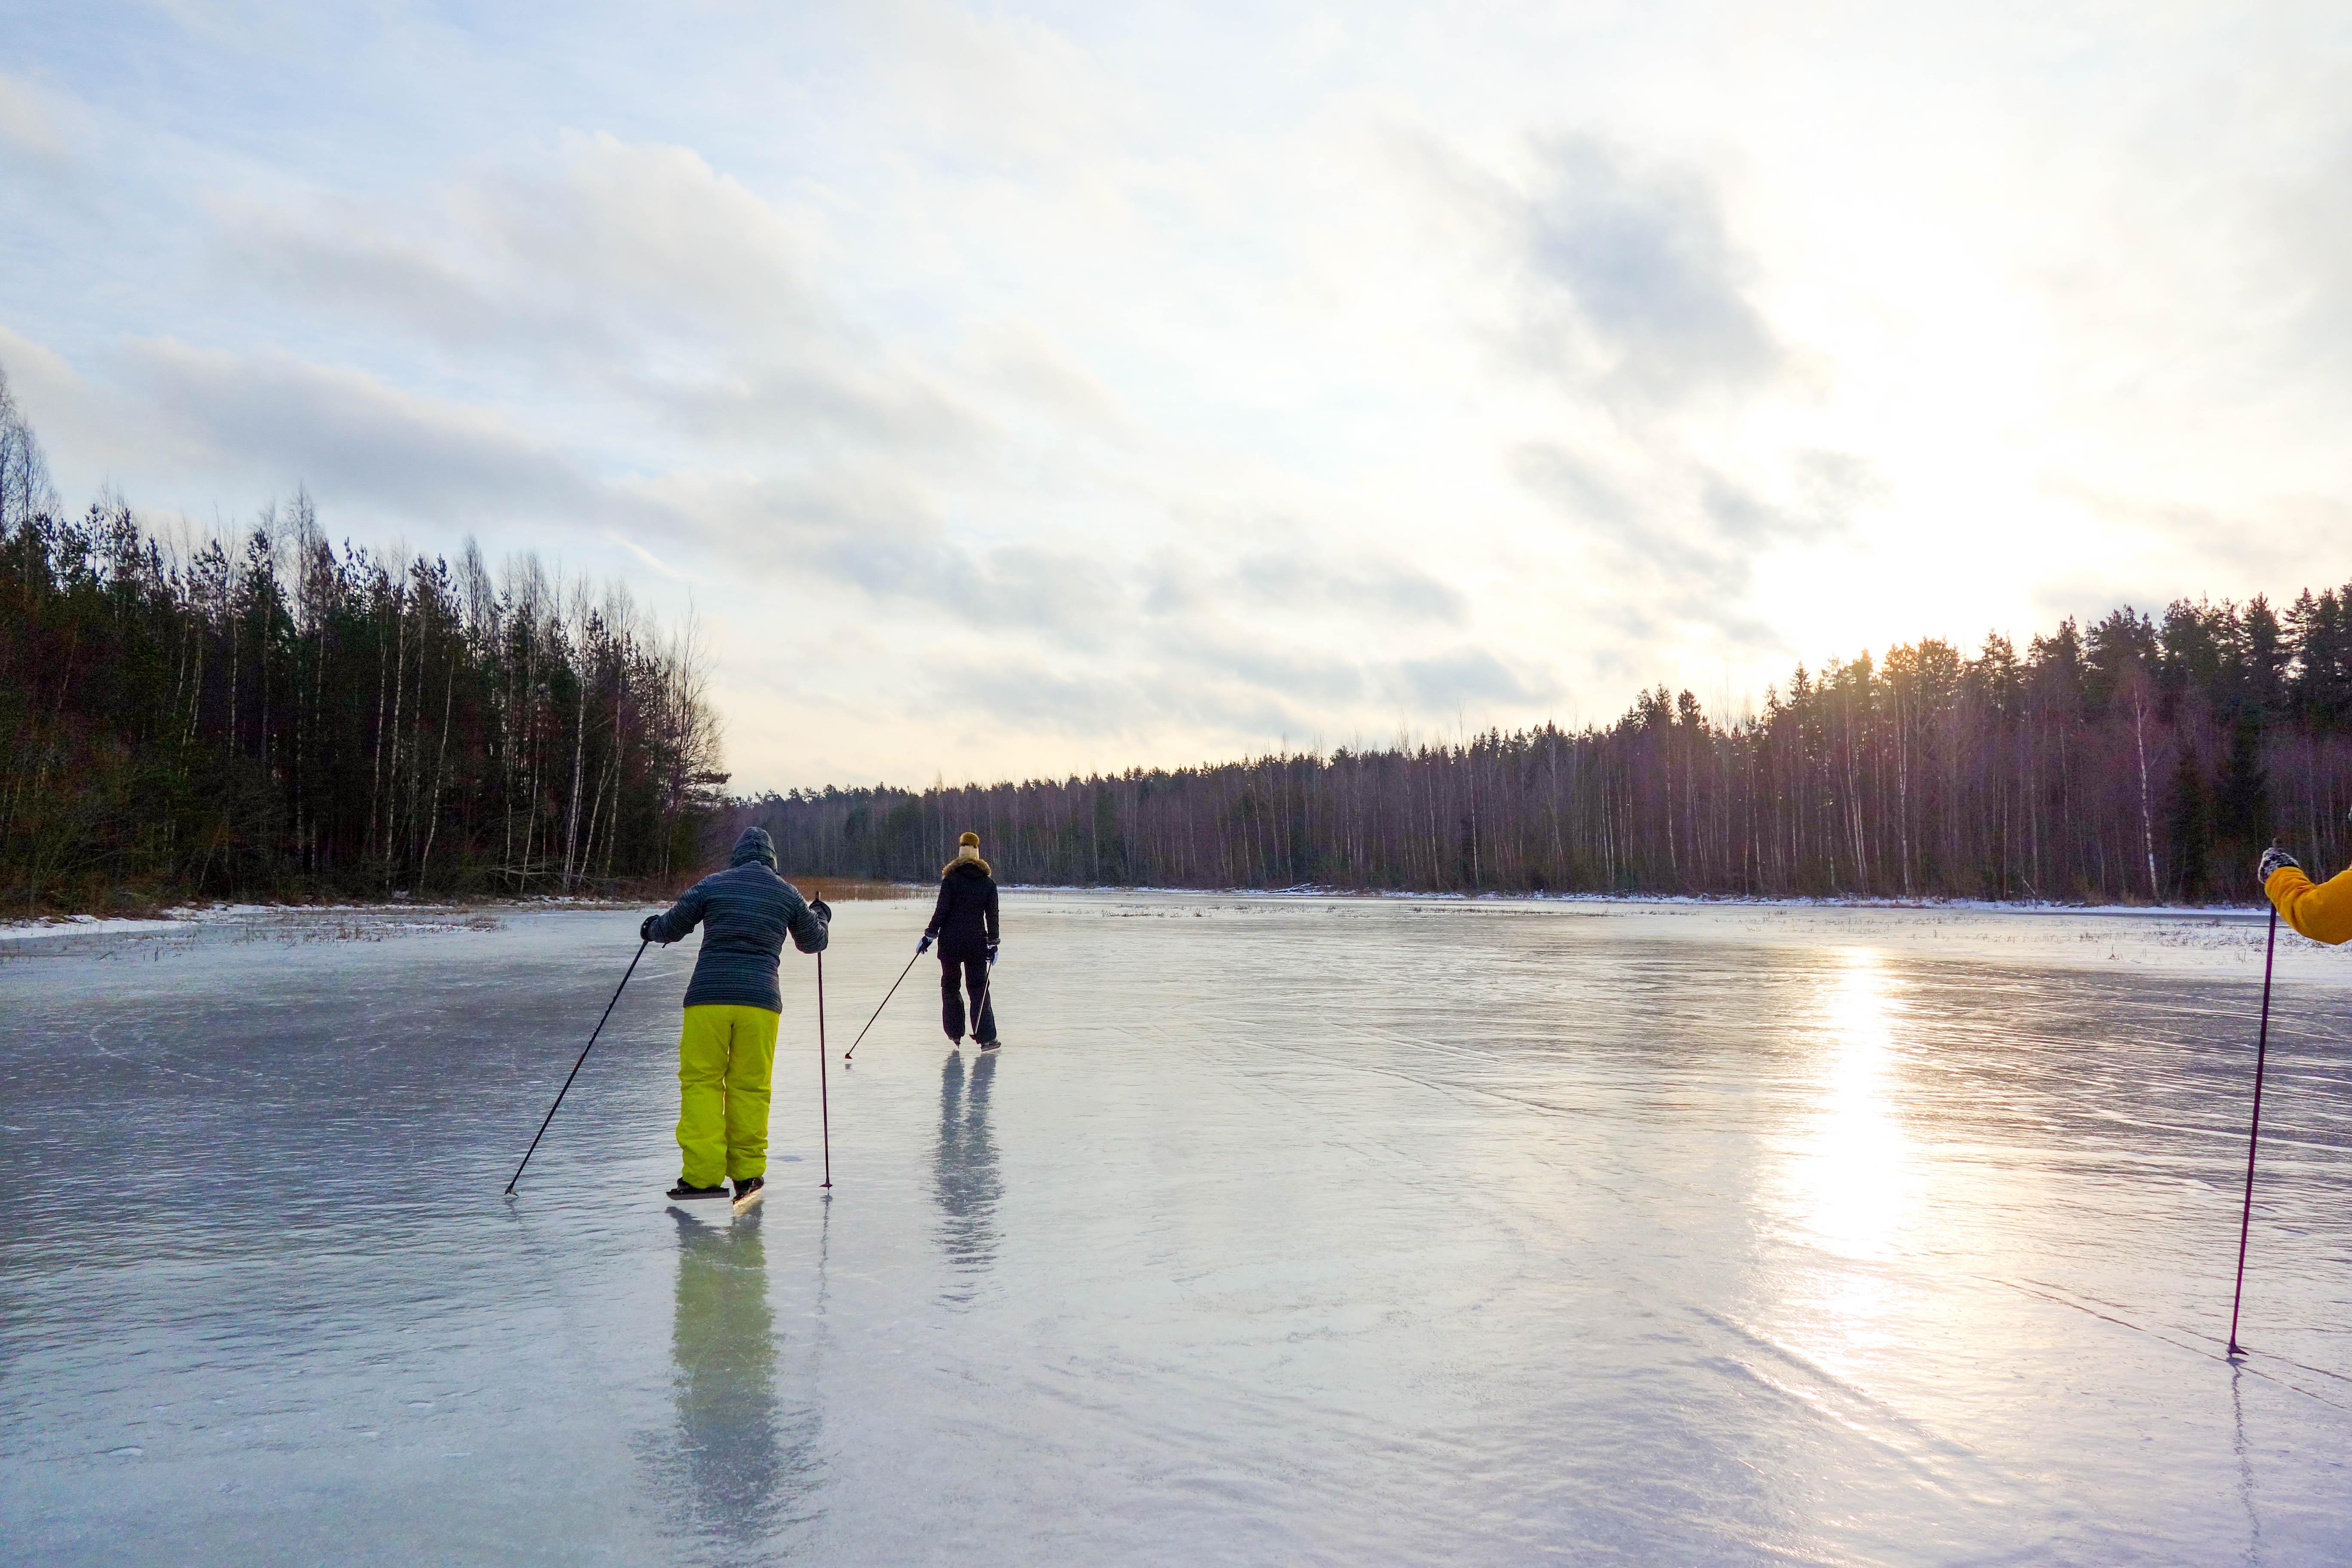 ©Prangli Travel. Talvine uisutamine järvedel